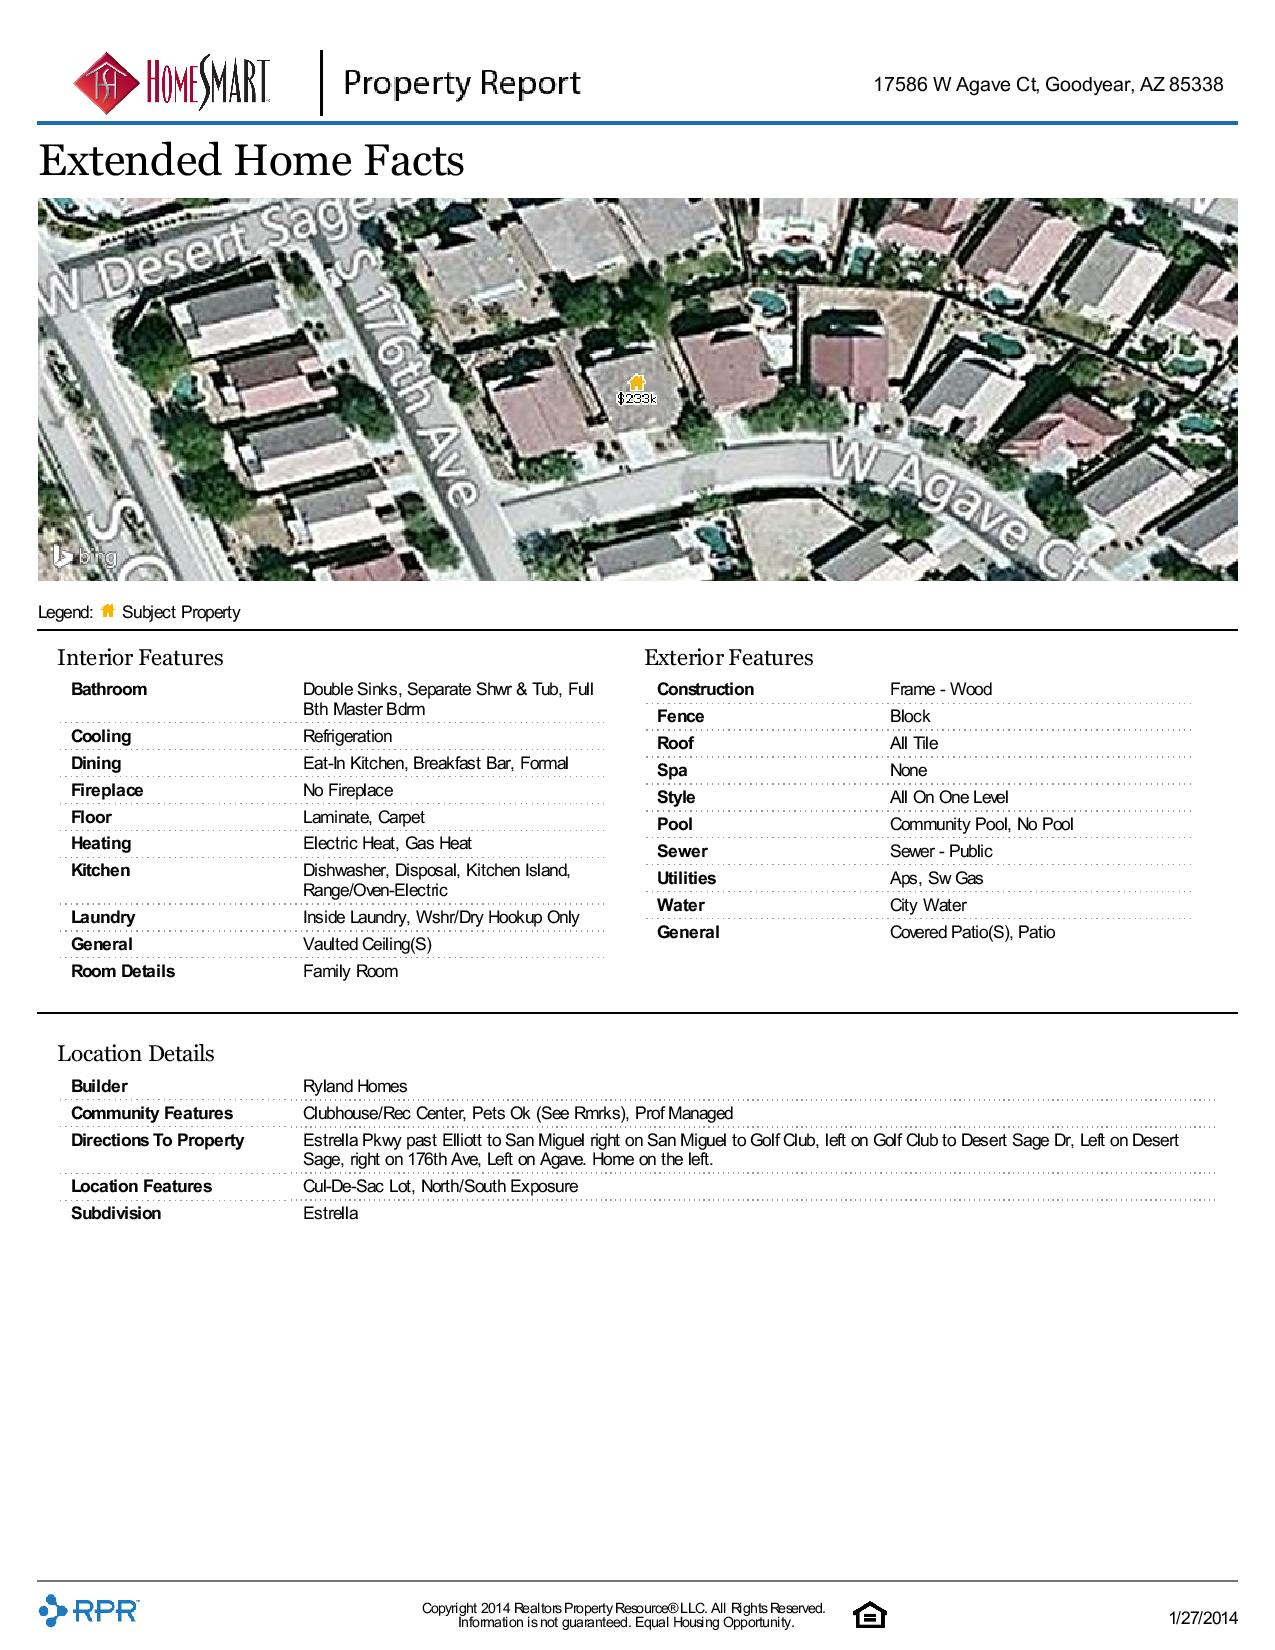 17586-W-Agave-Ct-Goodyear-AZ-85338.pdf-page-004